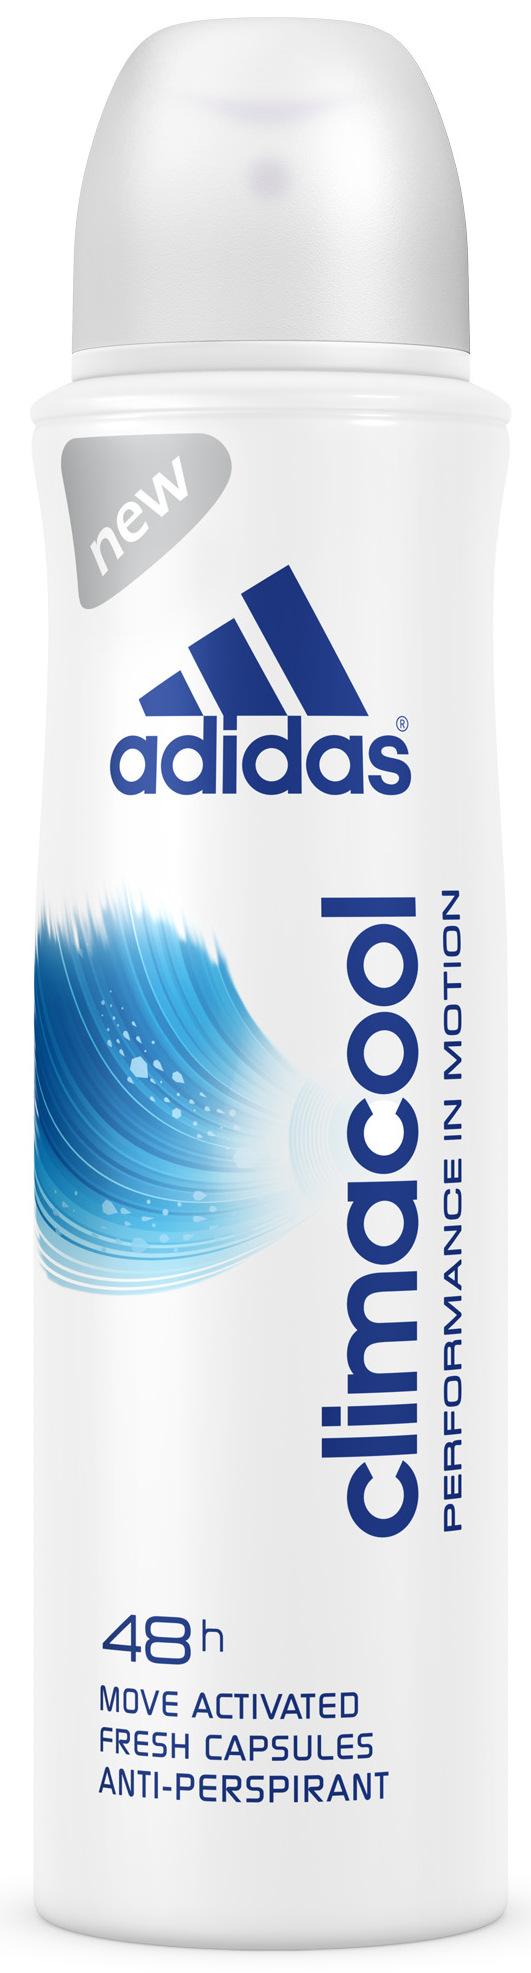 Fotografie Adidas Climacool 48h antiperspitant deodorant sprej pro ženy 150 ml